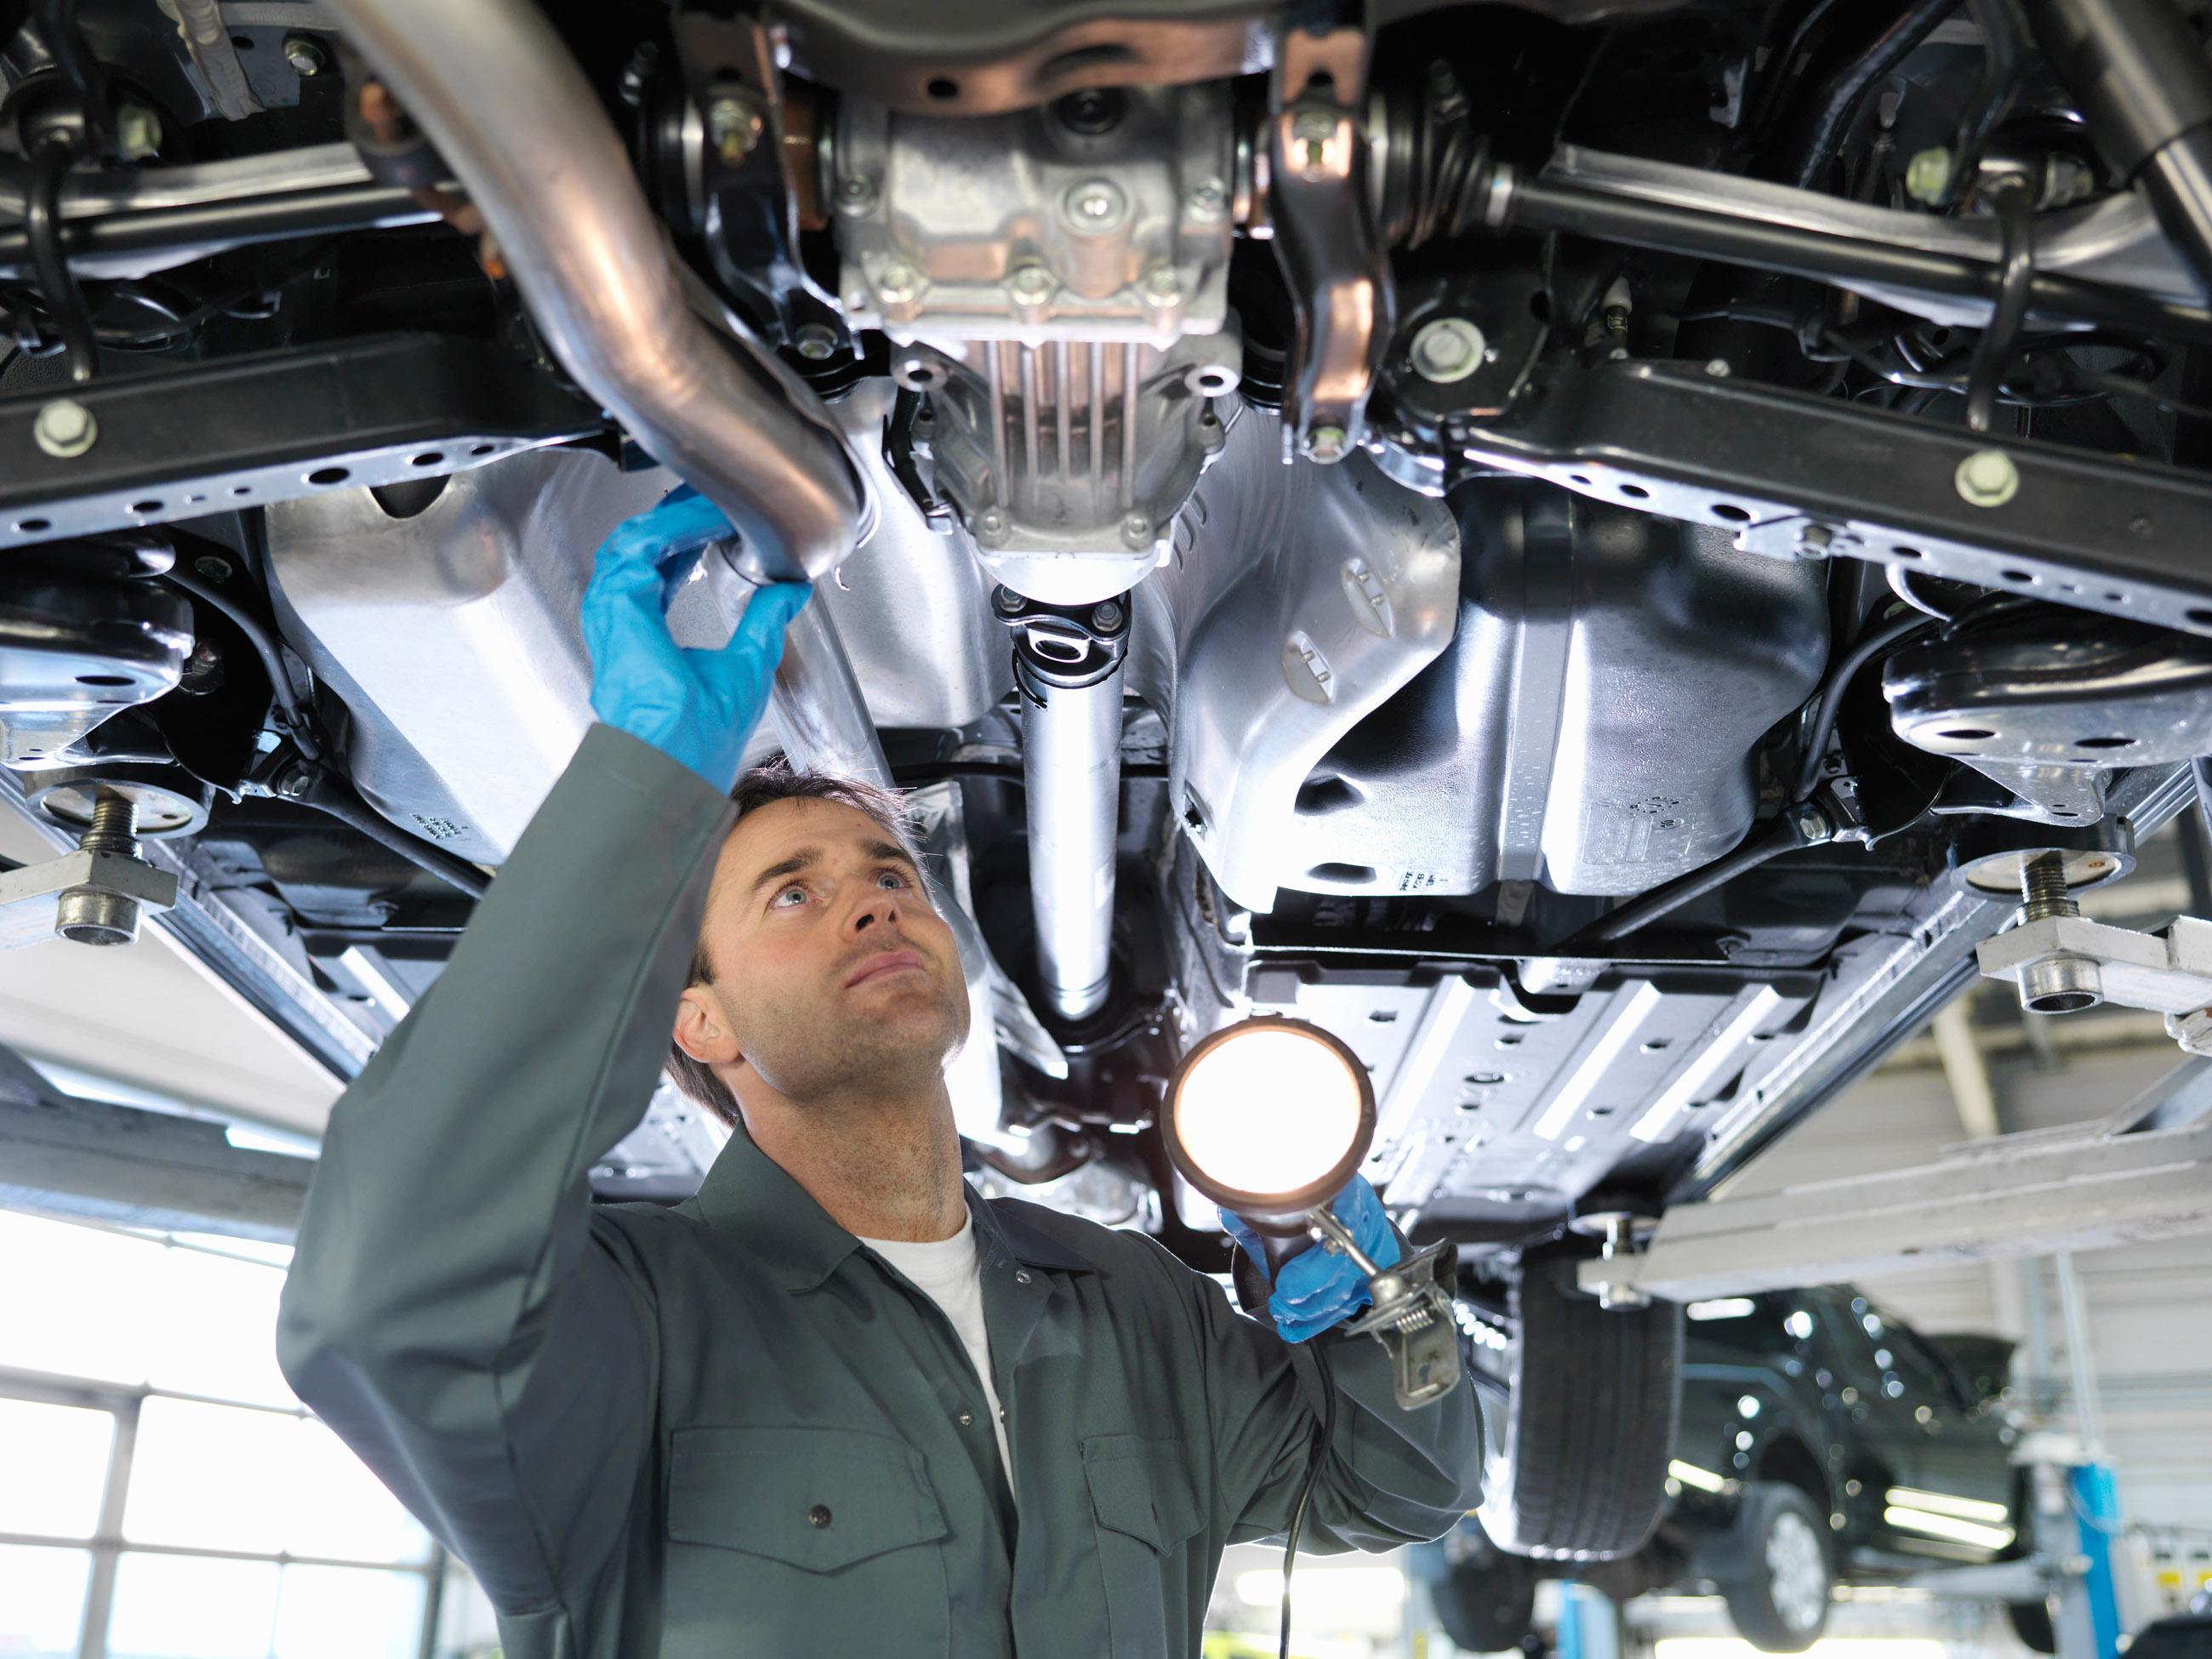 Mechanic working under car --- Image by © Monty Rakusen/cultura/Corbis